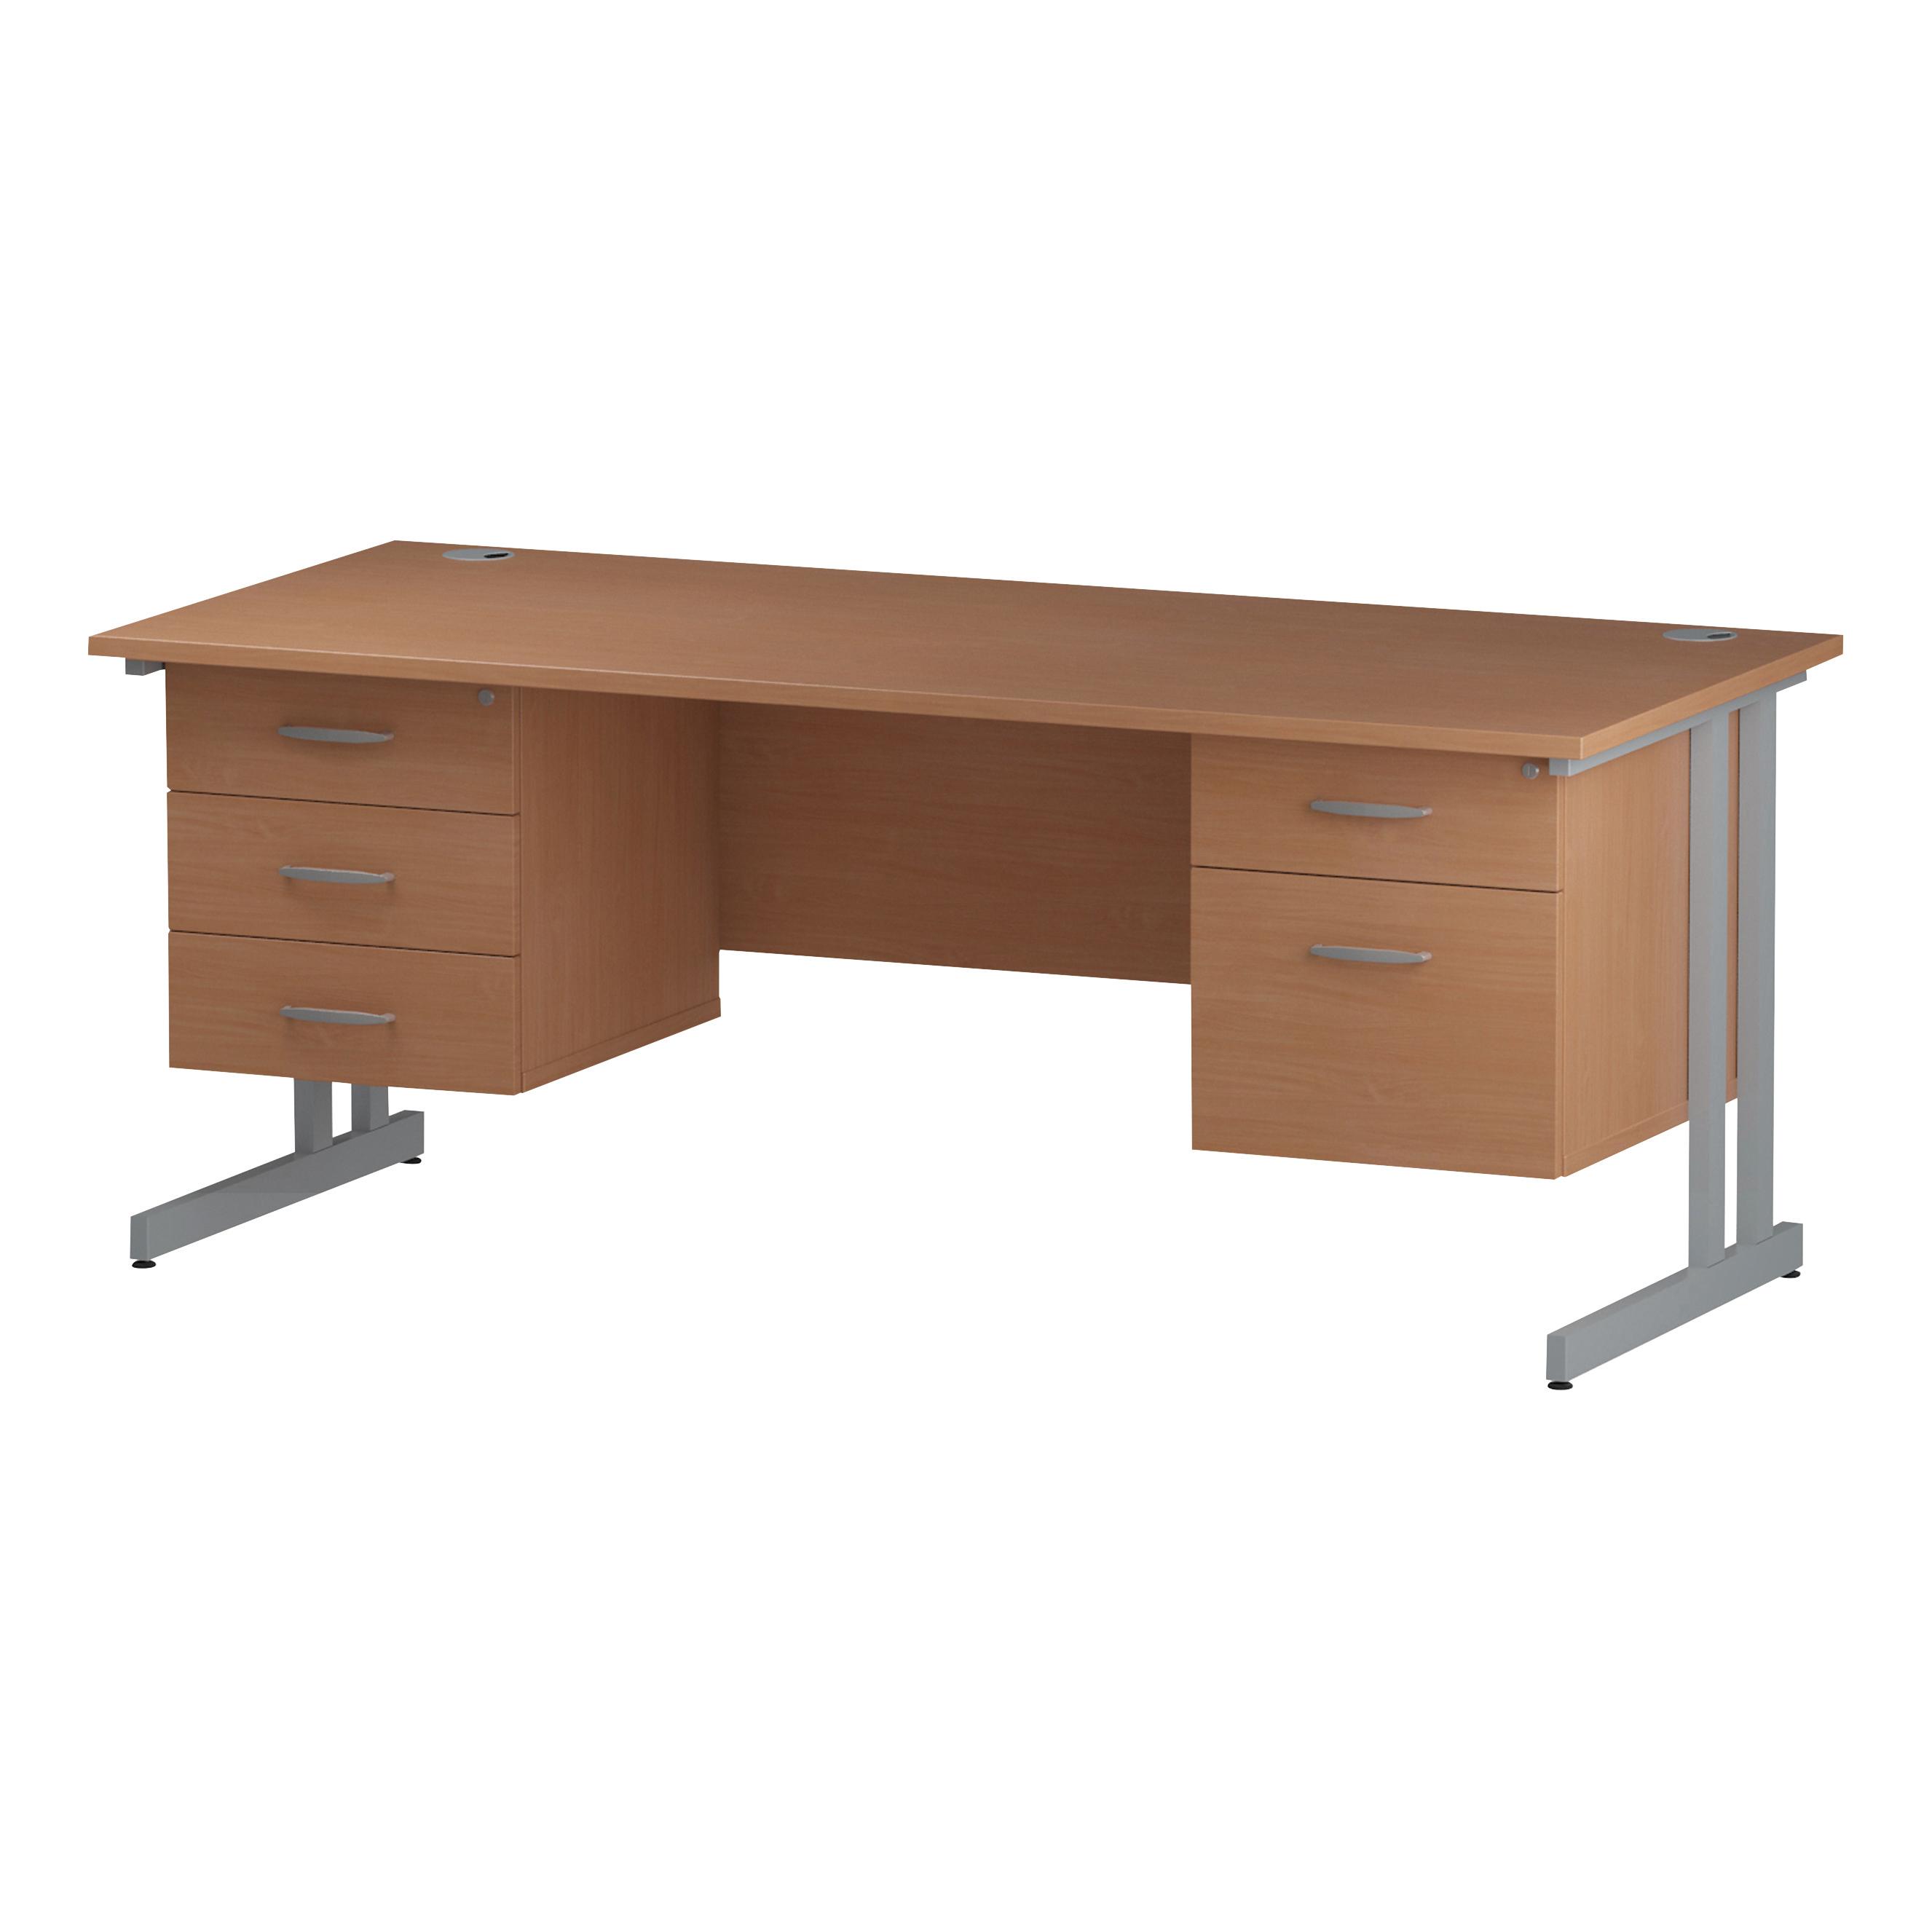 Trexus Rectangular Desk Silver Cantilever Leg 1800x800mm Double Fixed Ped 2&3 Drawers Beech Ref I001723